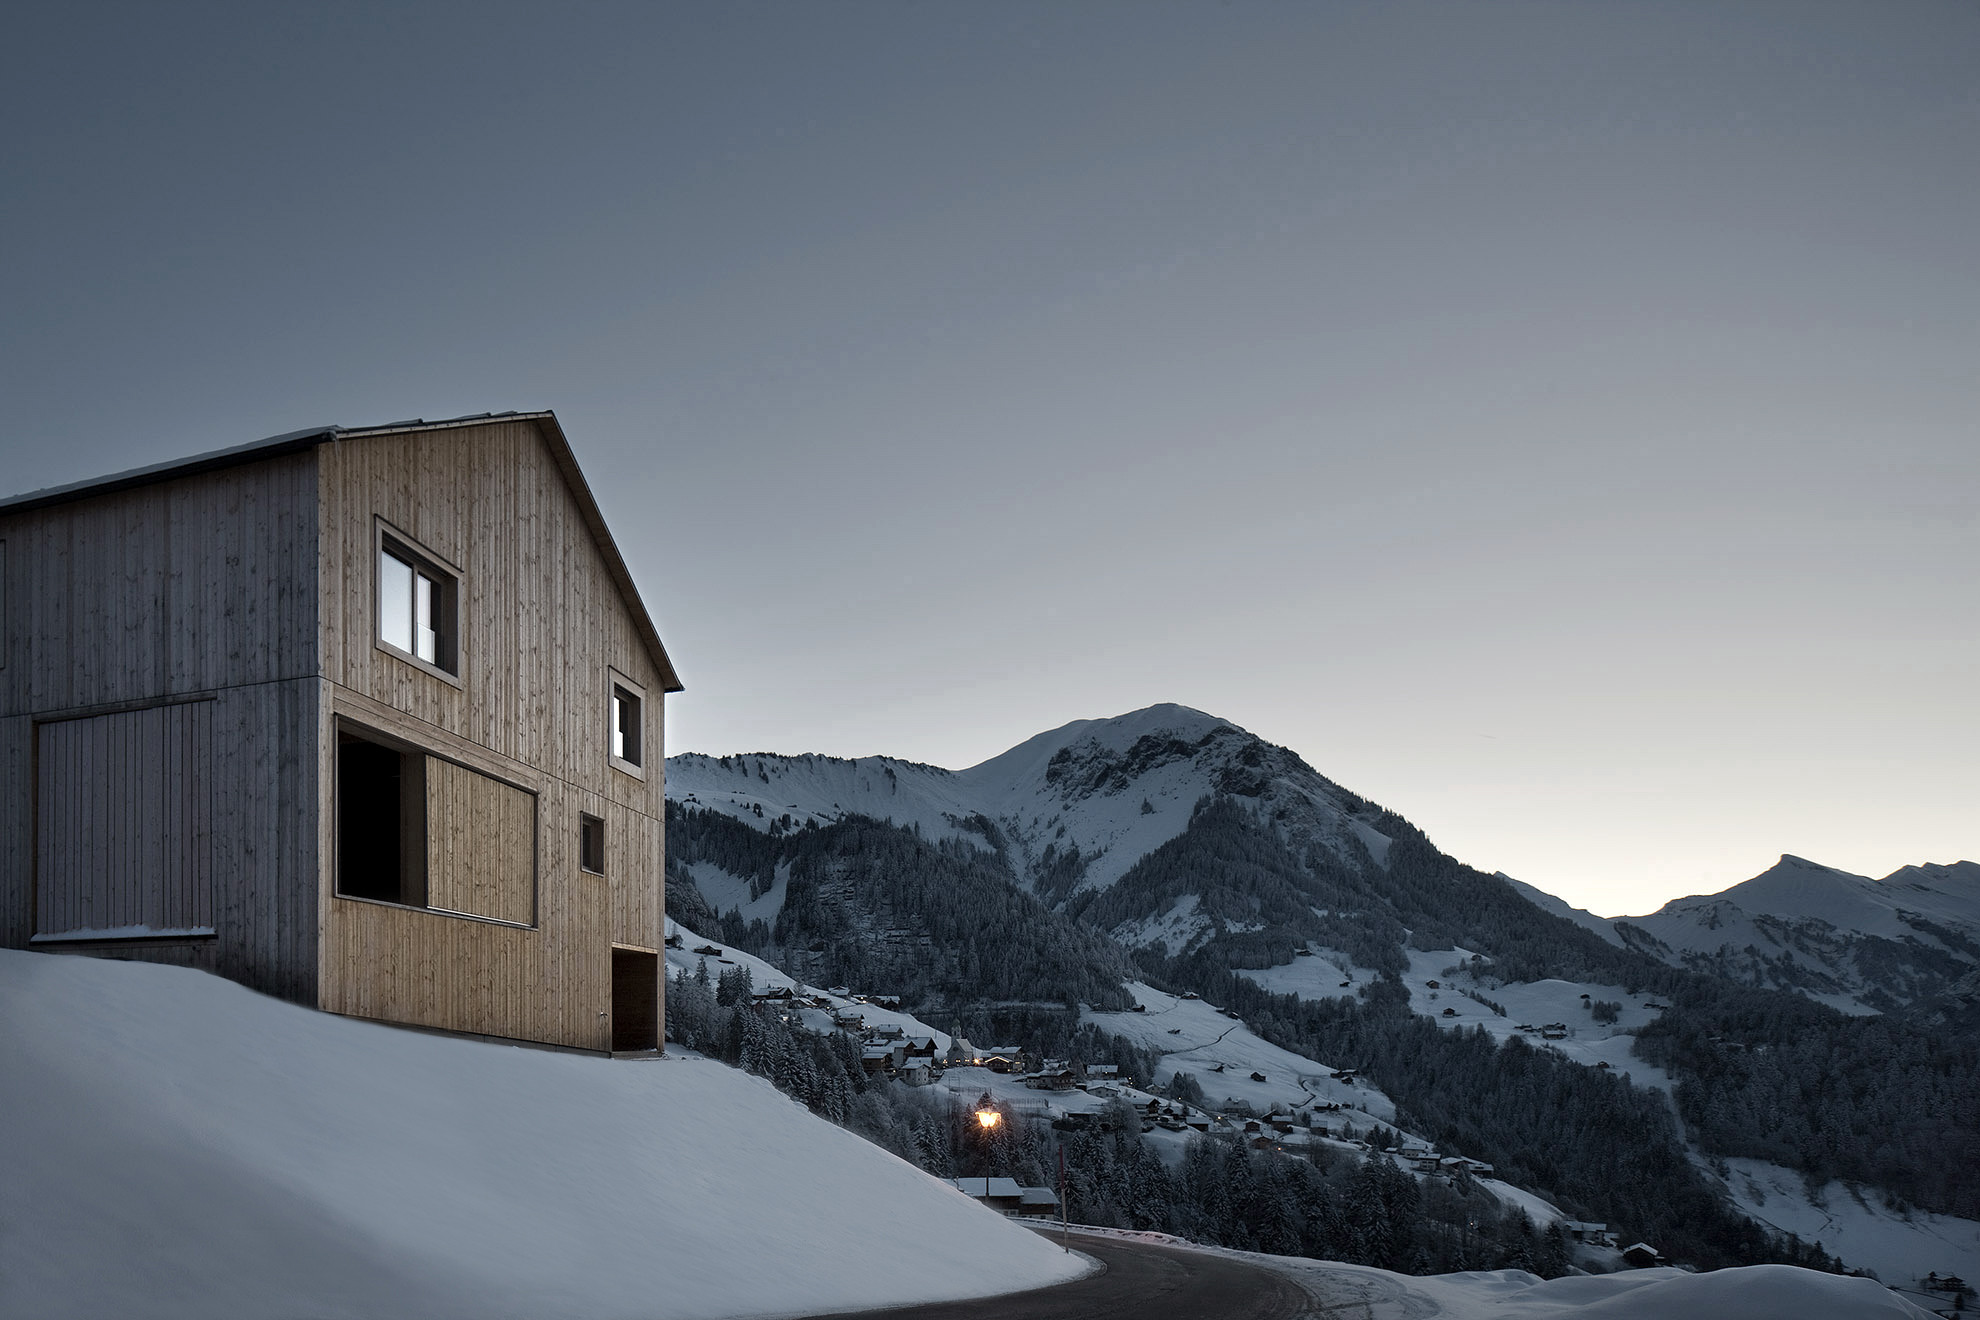 Haus Fontanella / Bernardo Bader Architects, © Albrecht Imanuel Schnabel